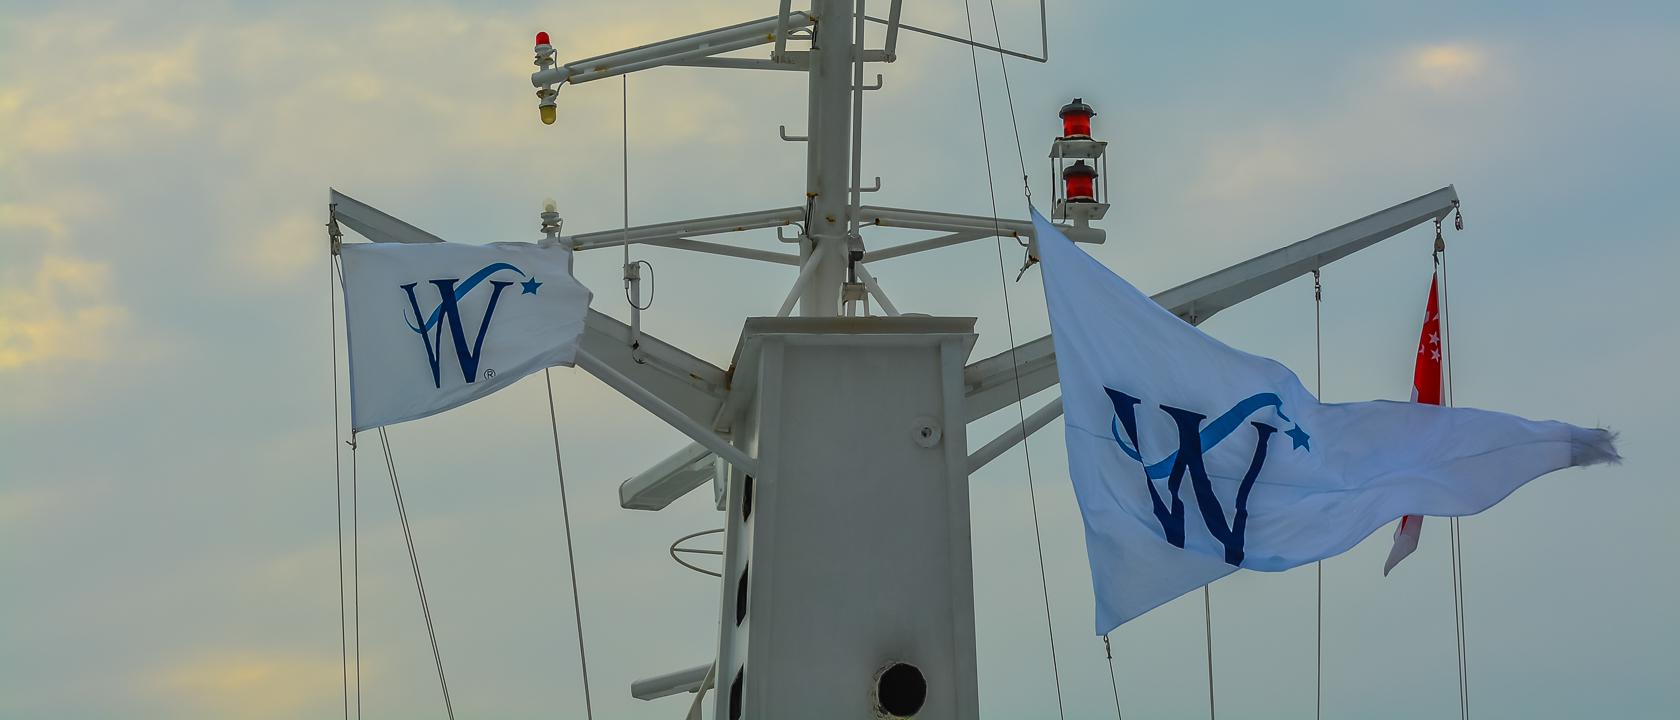 Windstar Onboard Booking Yacht Club Bring Bonus Value